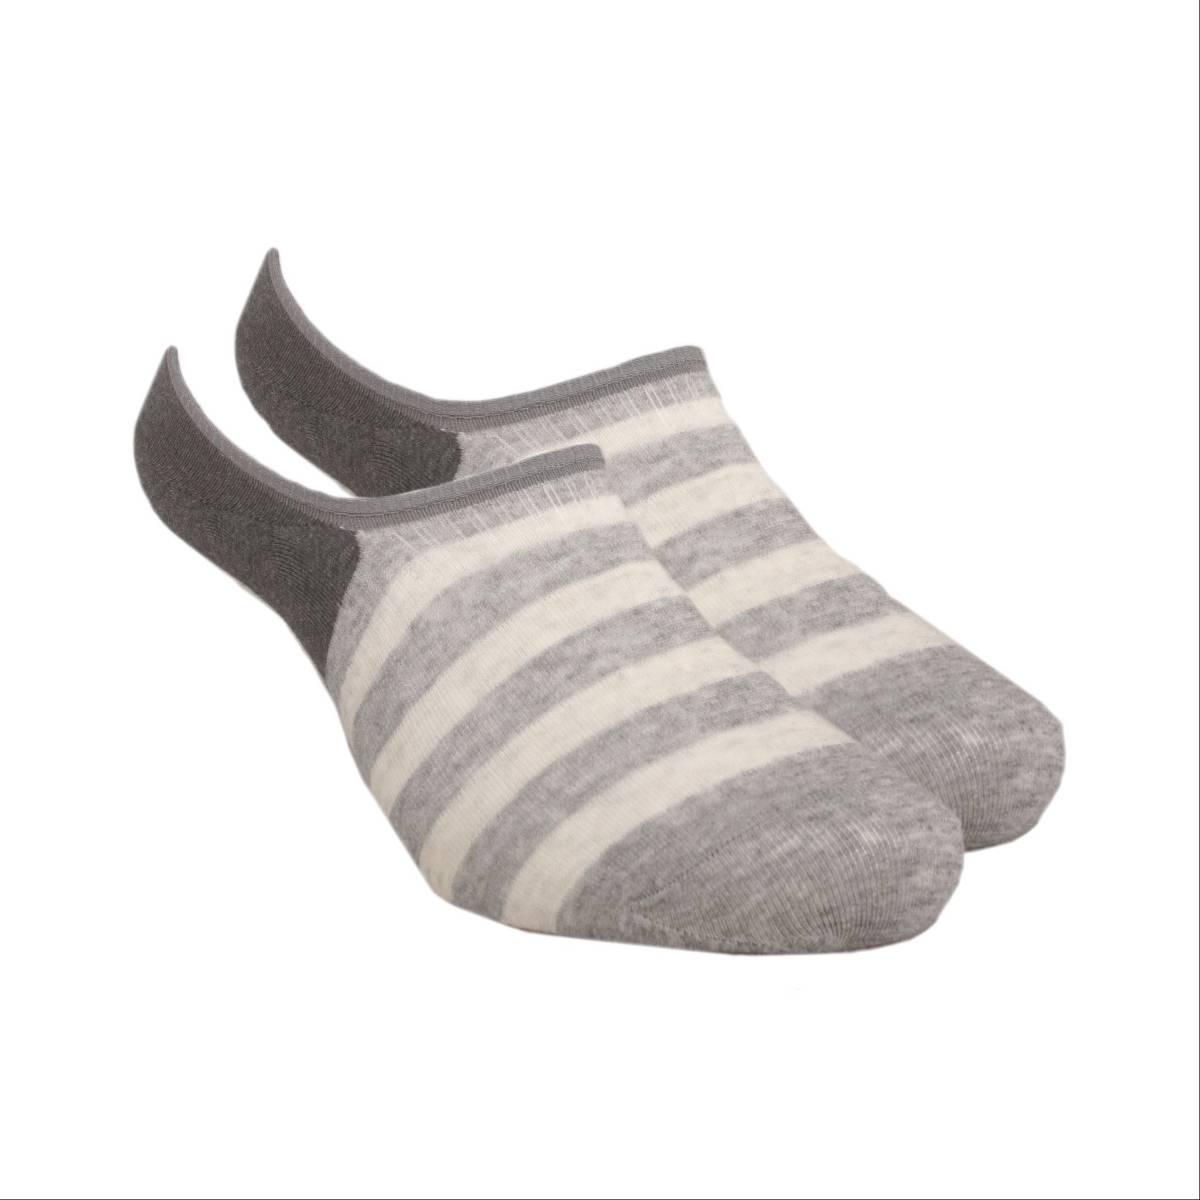 Kaos Kaki / Orleans Gray Socks